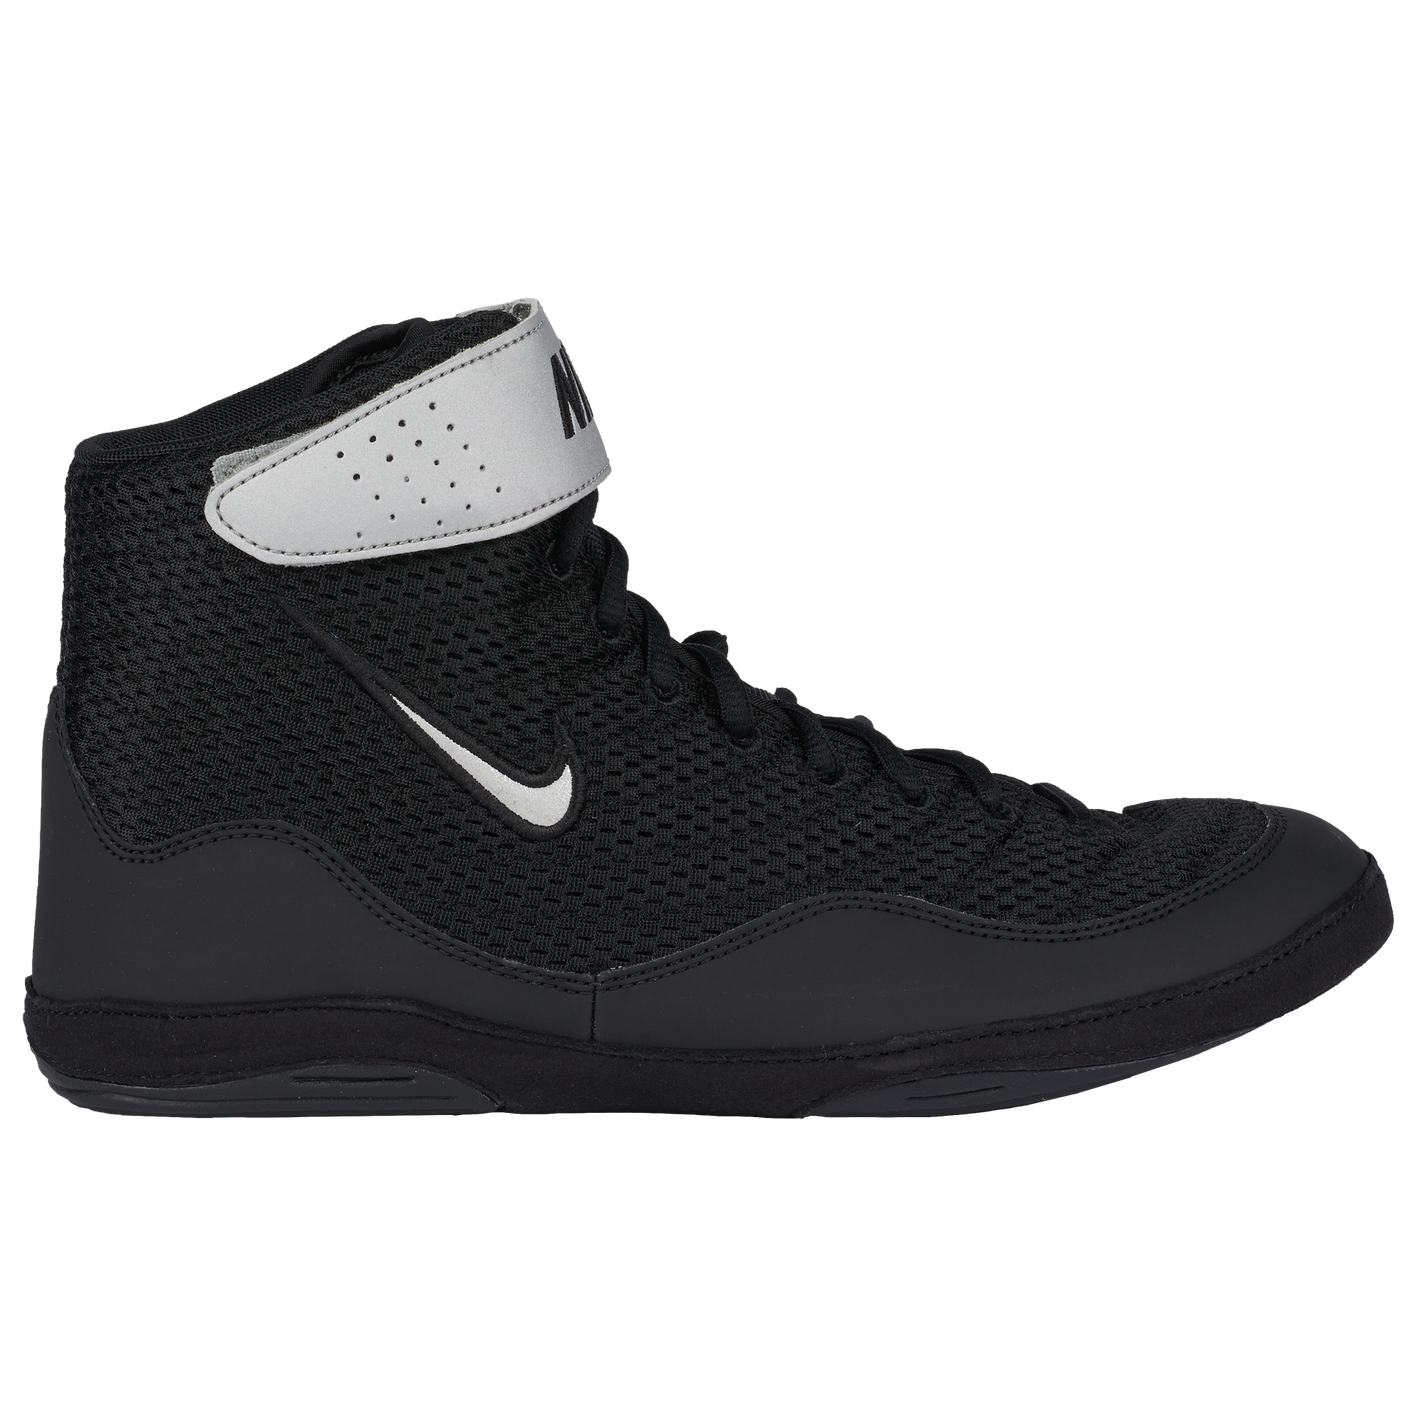 Nike Inflict 3 - Men s - Wrestling - Shoes - Black Metallic Silver White 002d58948